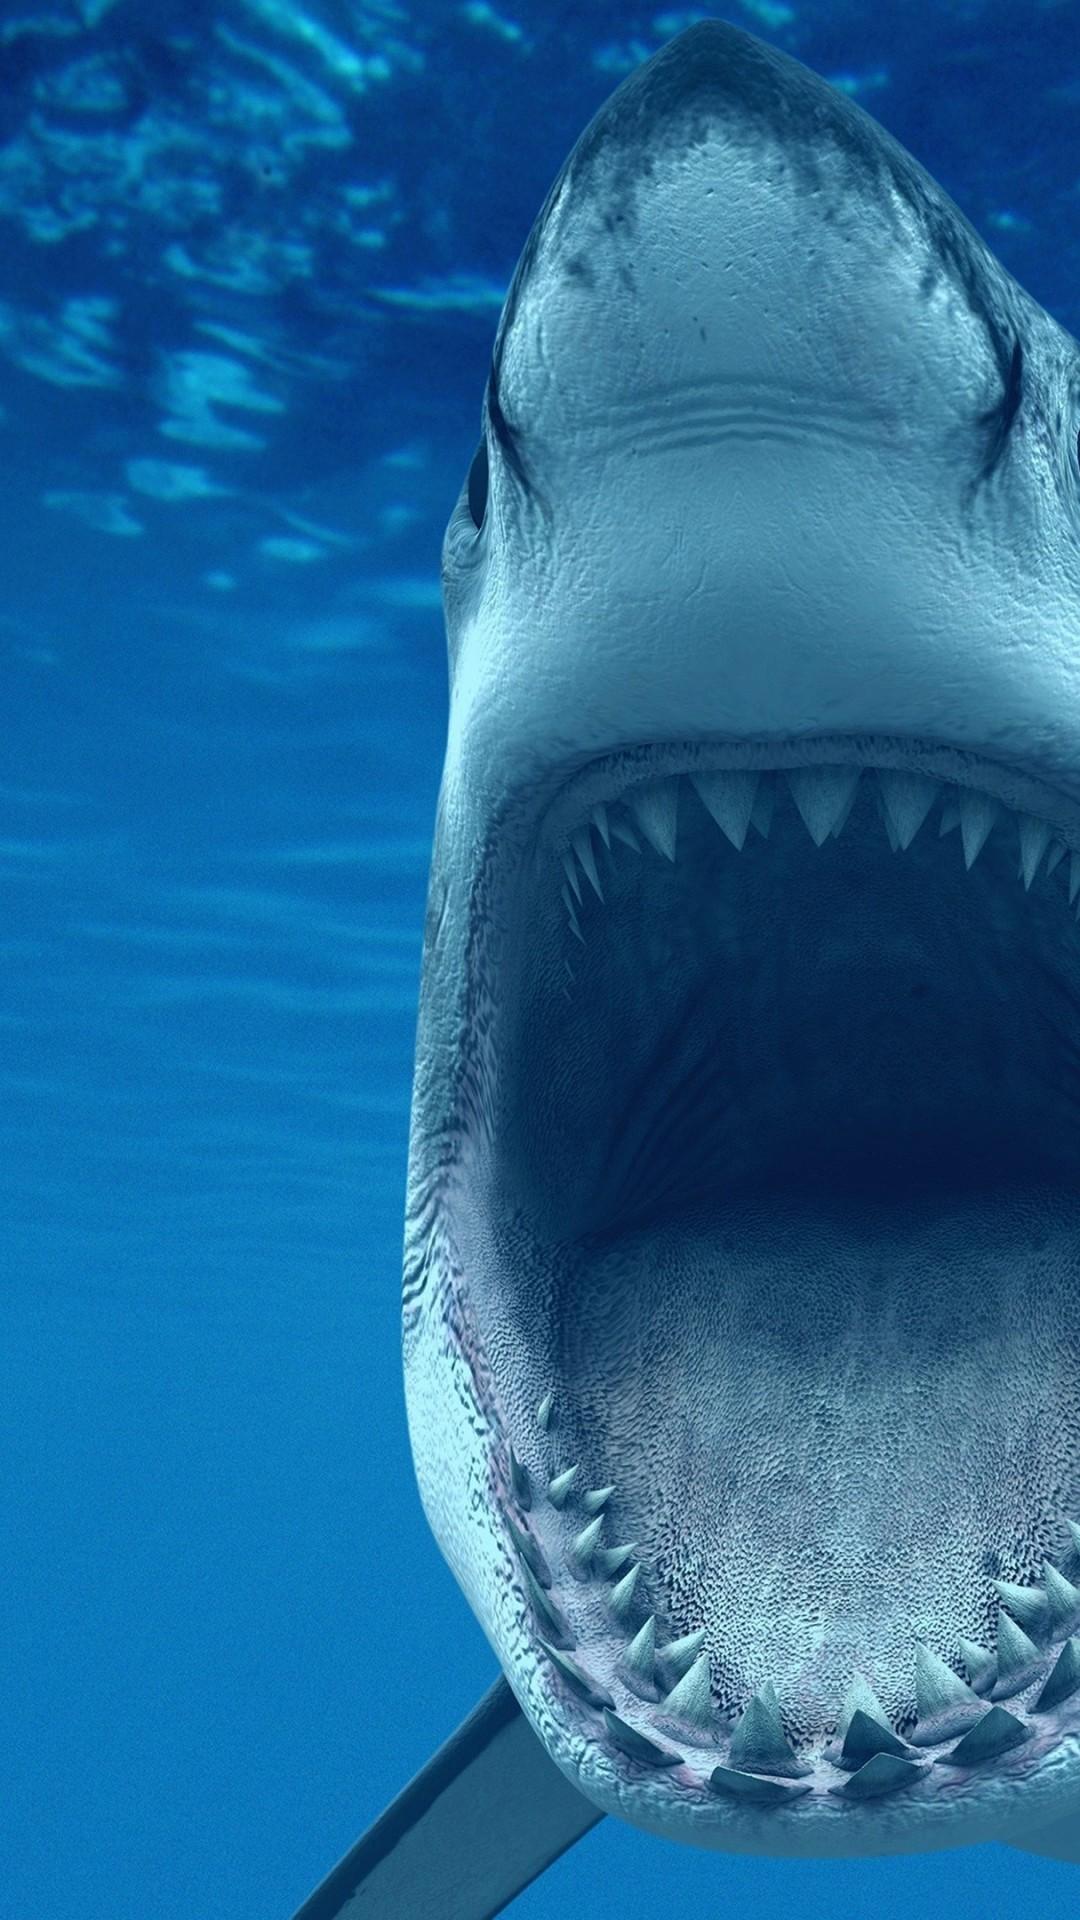 Wallpaper white shark 4k hd wallpaper caribbean aruba - Aquatic wallpaper ...